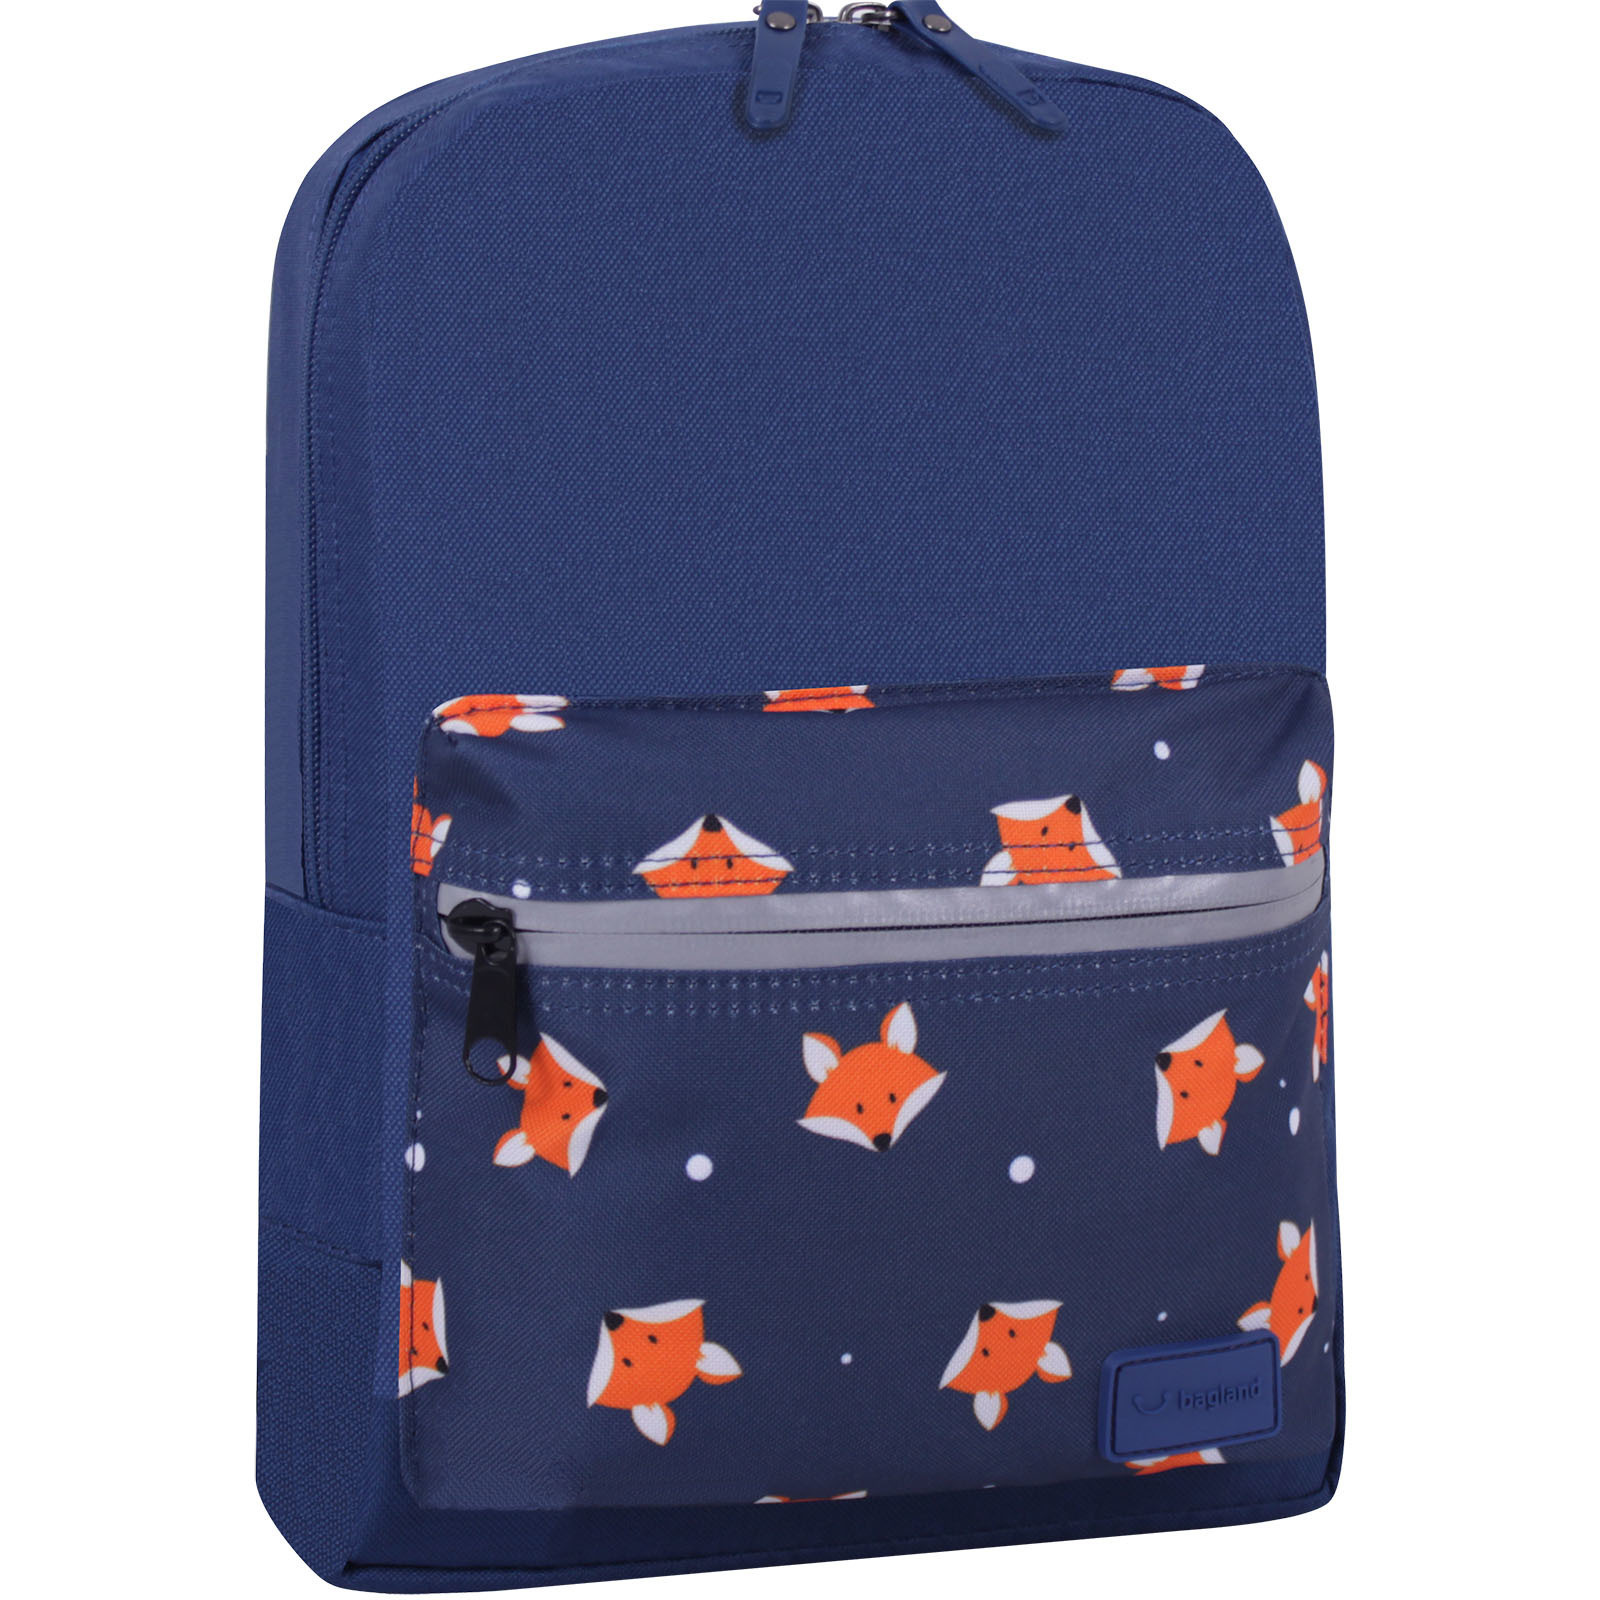 Молодежные рюкзаки Рюкзак Bagland Молодежный mini 8 л. синий 742 (0050866) IMG_6745_суб742_-1600.jpg